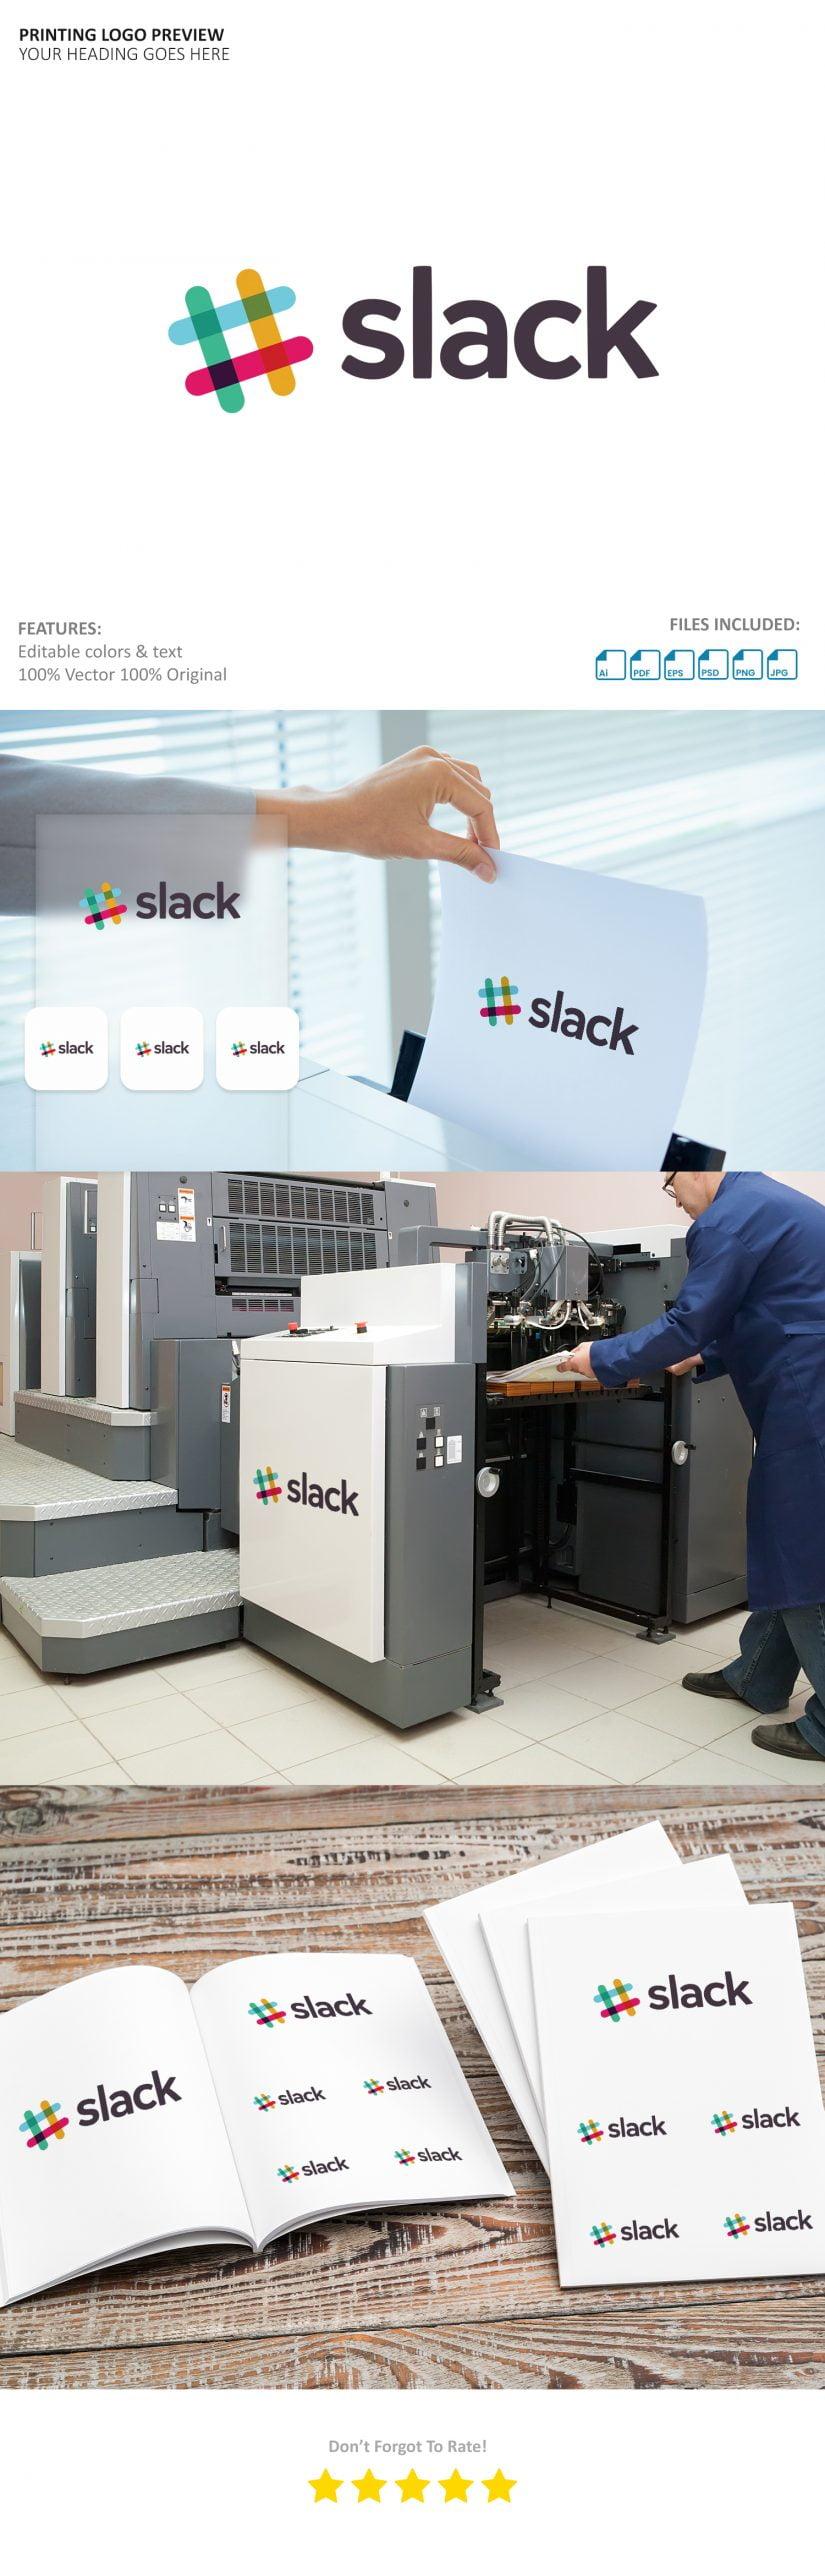 Free Printing Business Logo Preview Generator